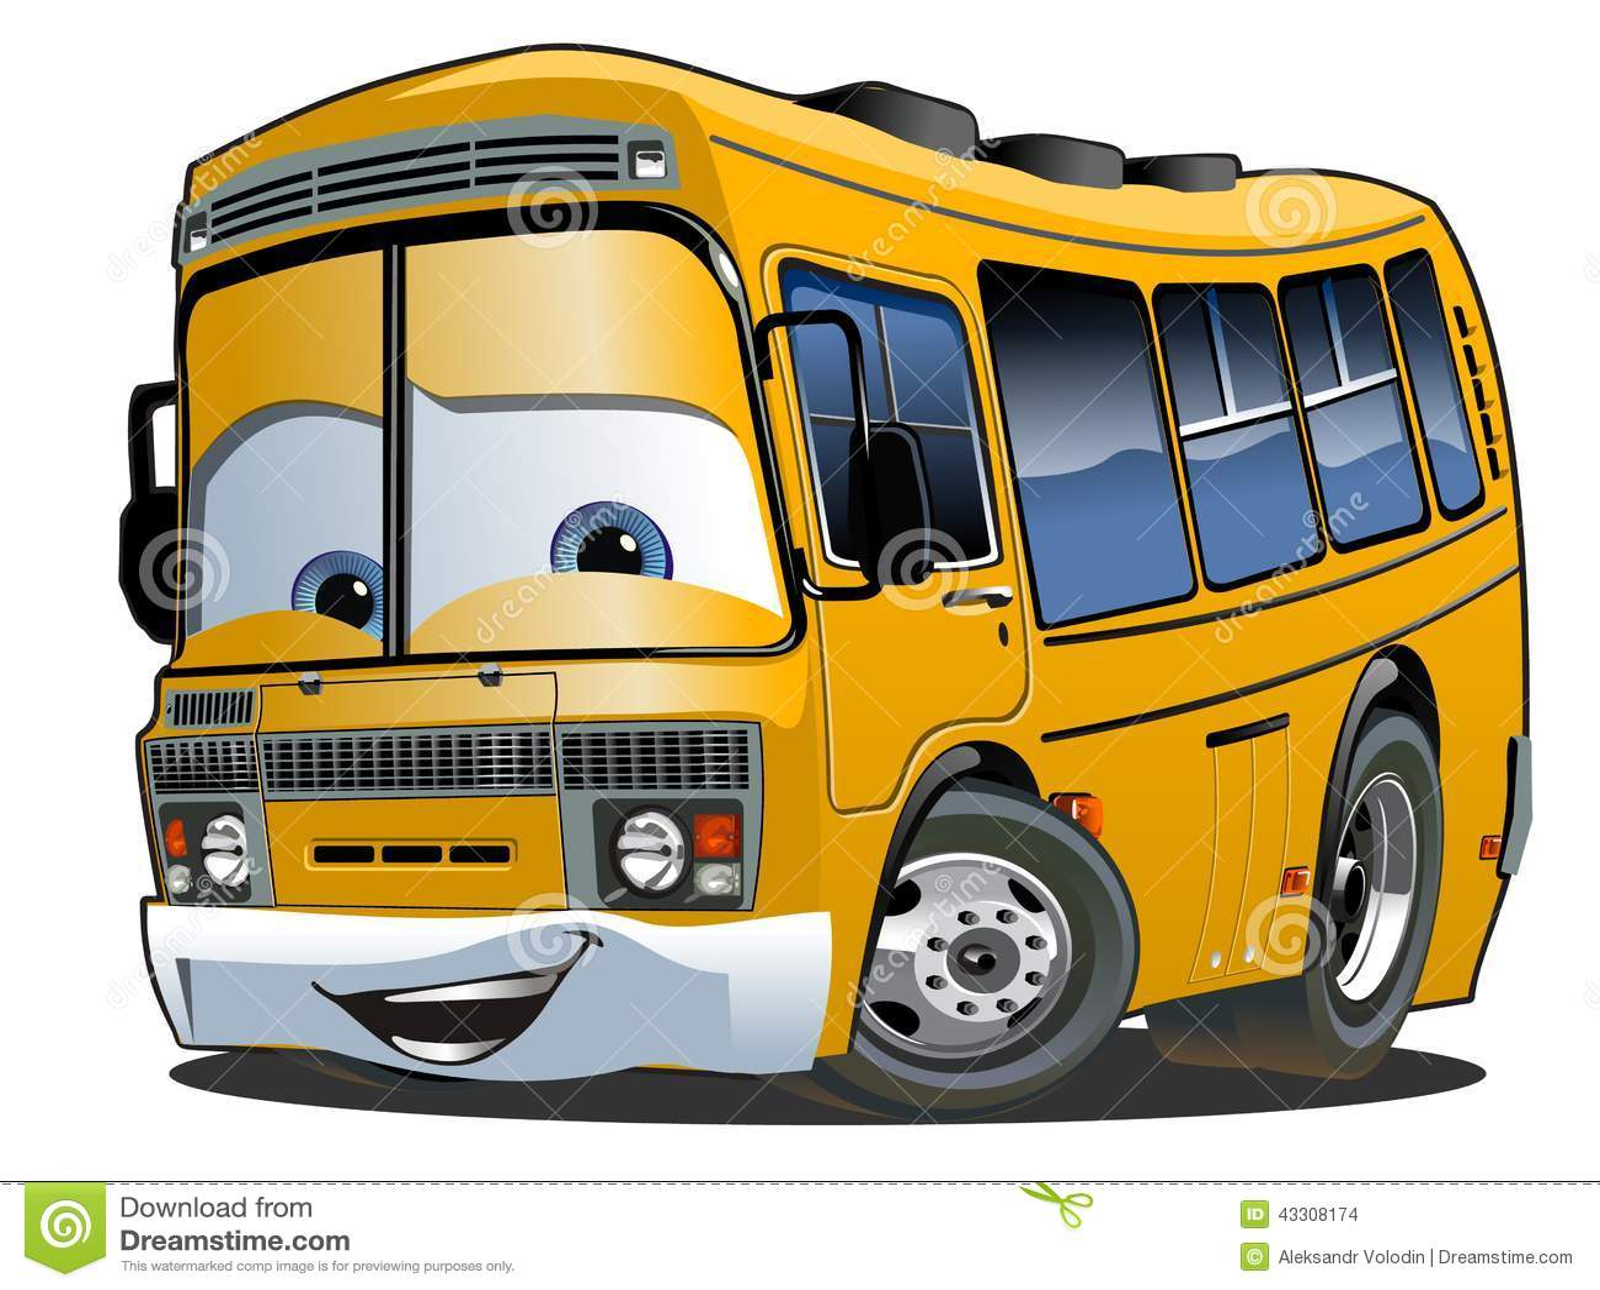 Download Cartoon School Bus stock vector. Illustration of design - 43308174